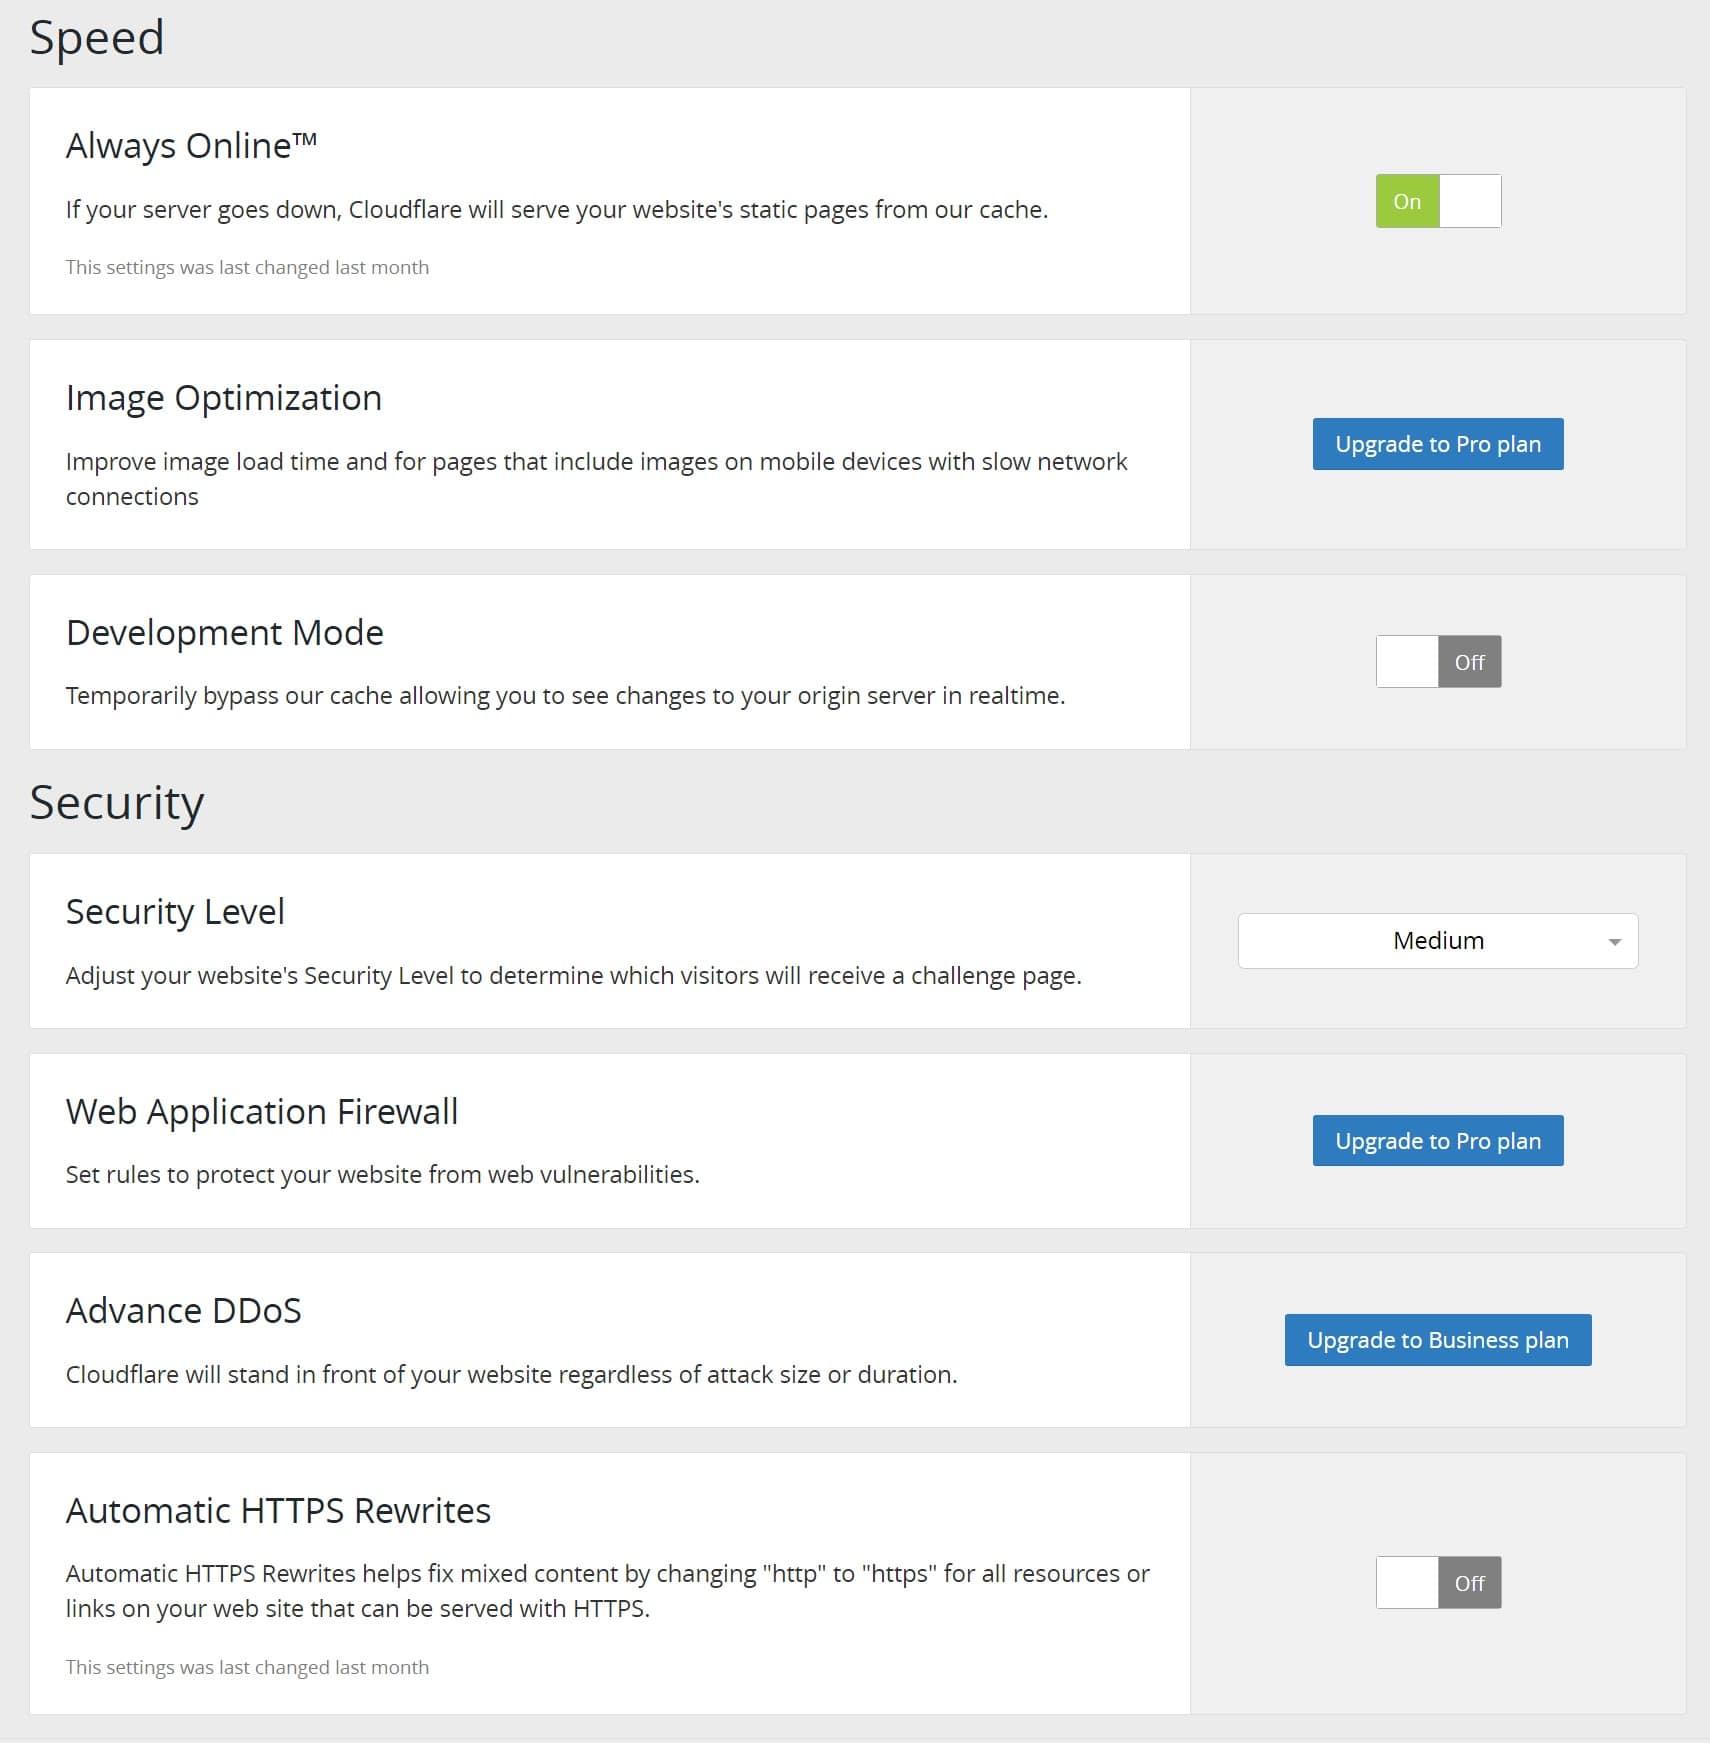 Cloudflare plug-in snelheids- en beveiligingsinstellingen